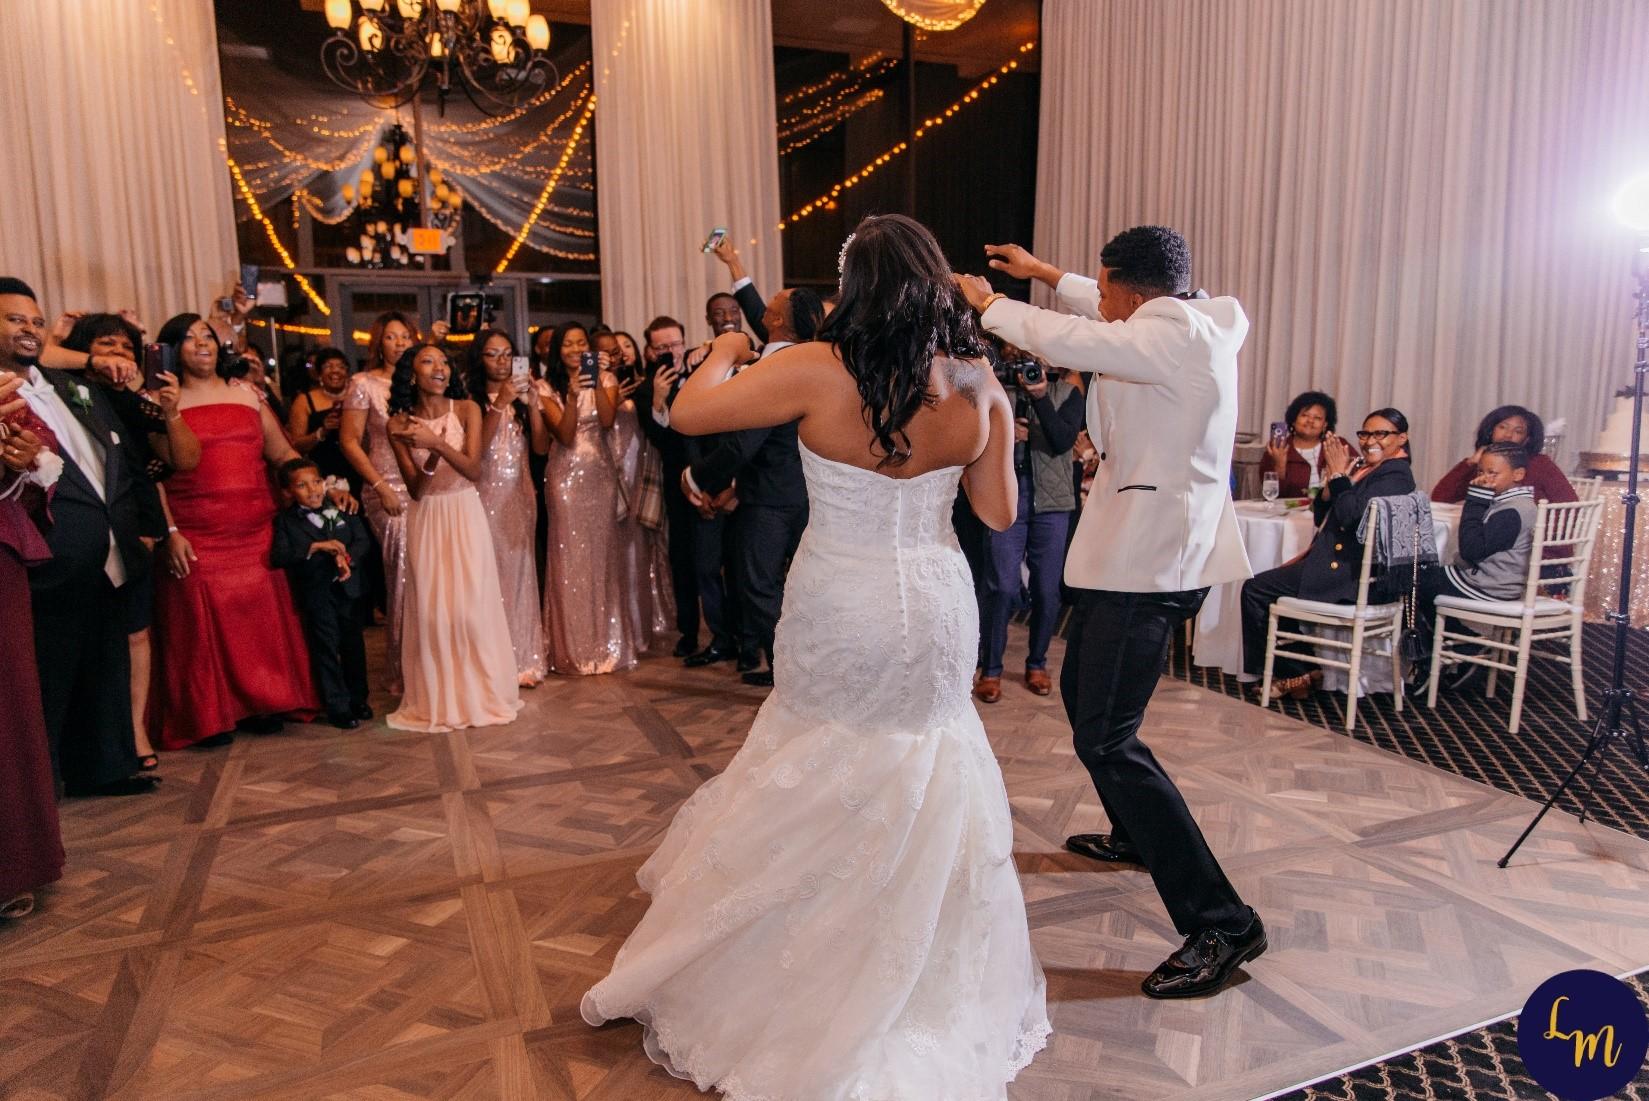 Dancing in Ballroom.jpg